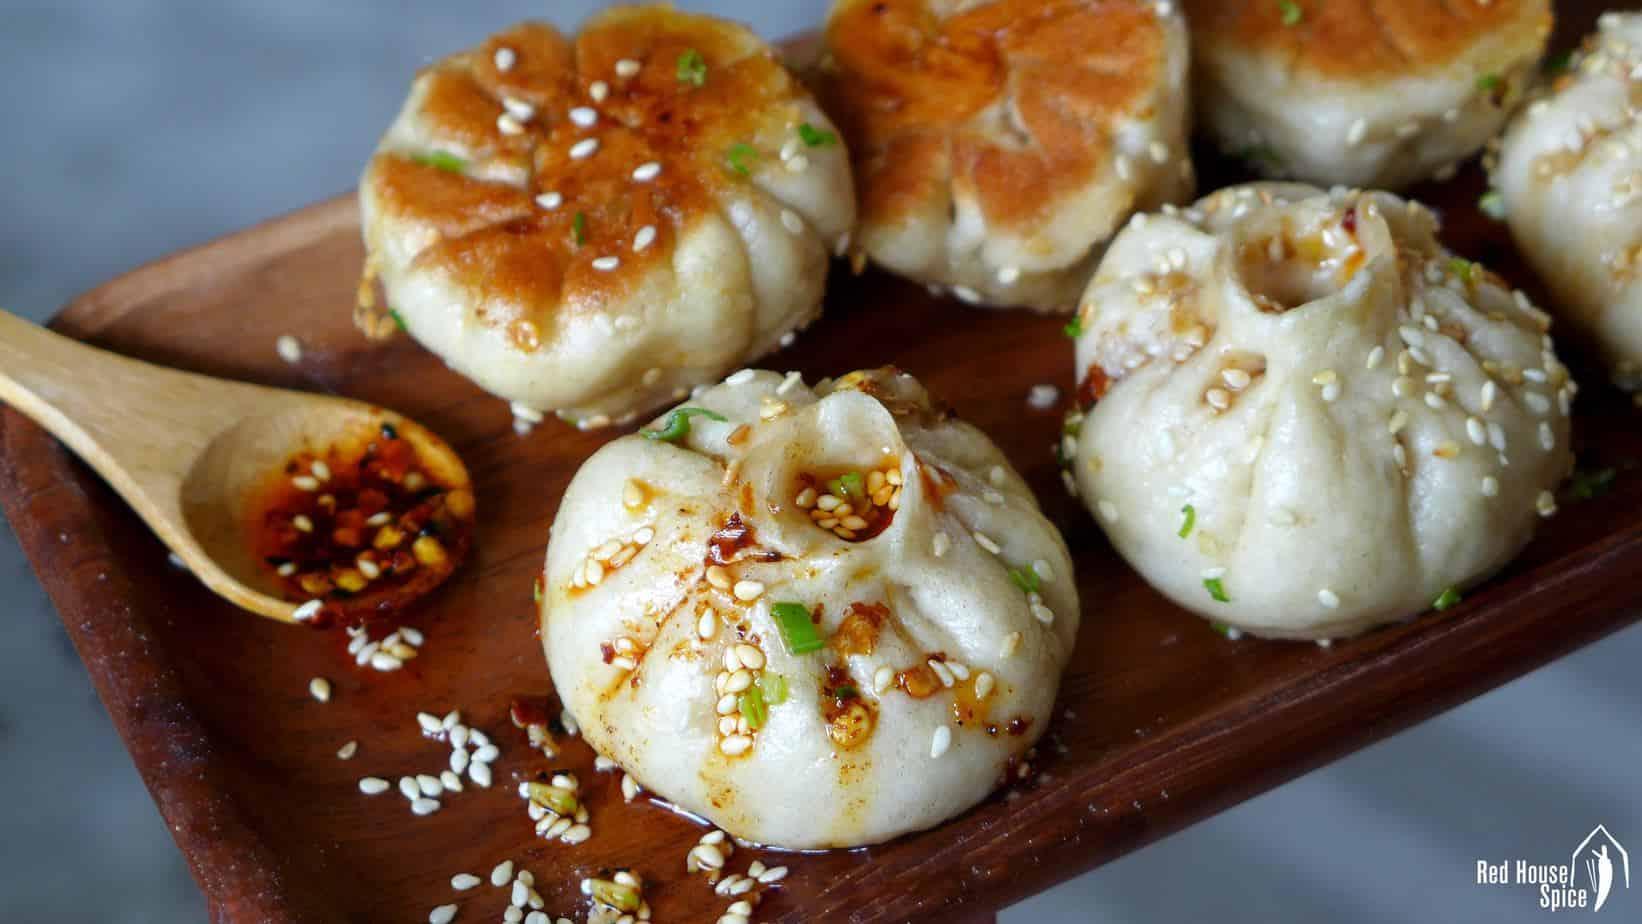 Sheng Jian Bao: Pan-fried pork buns (生煎包)